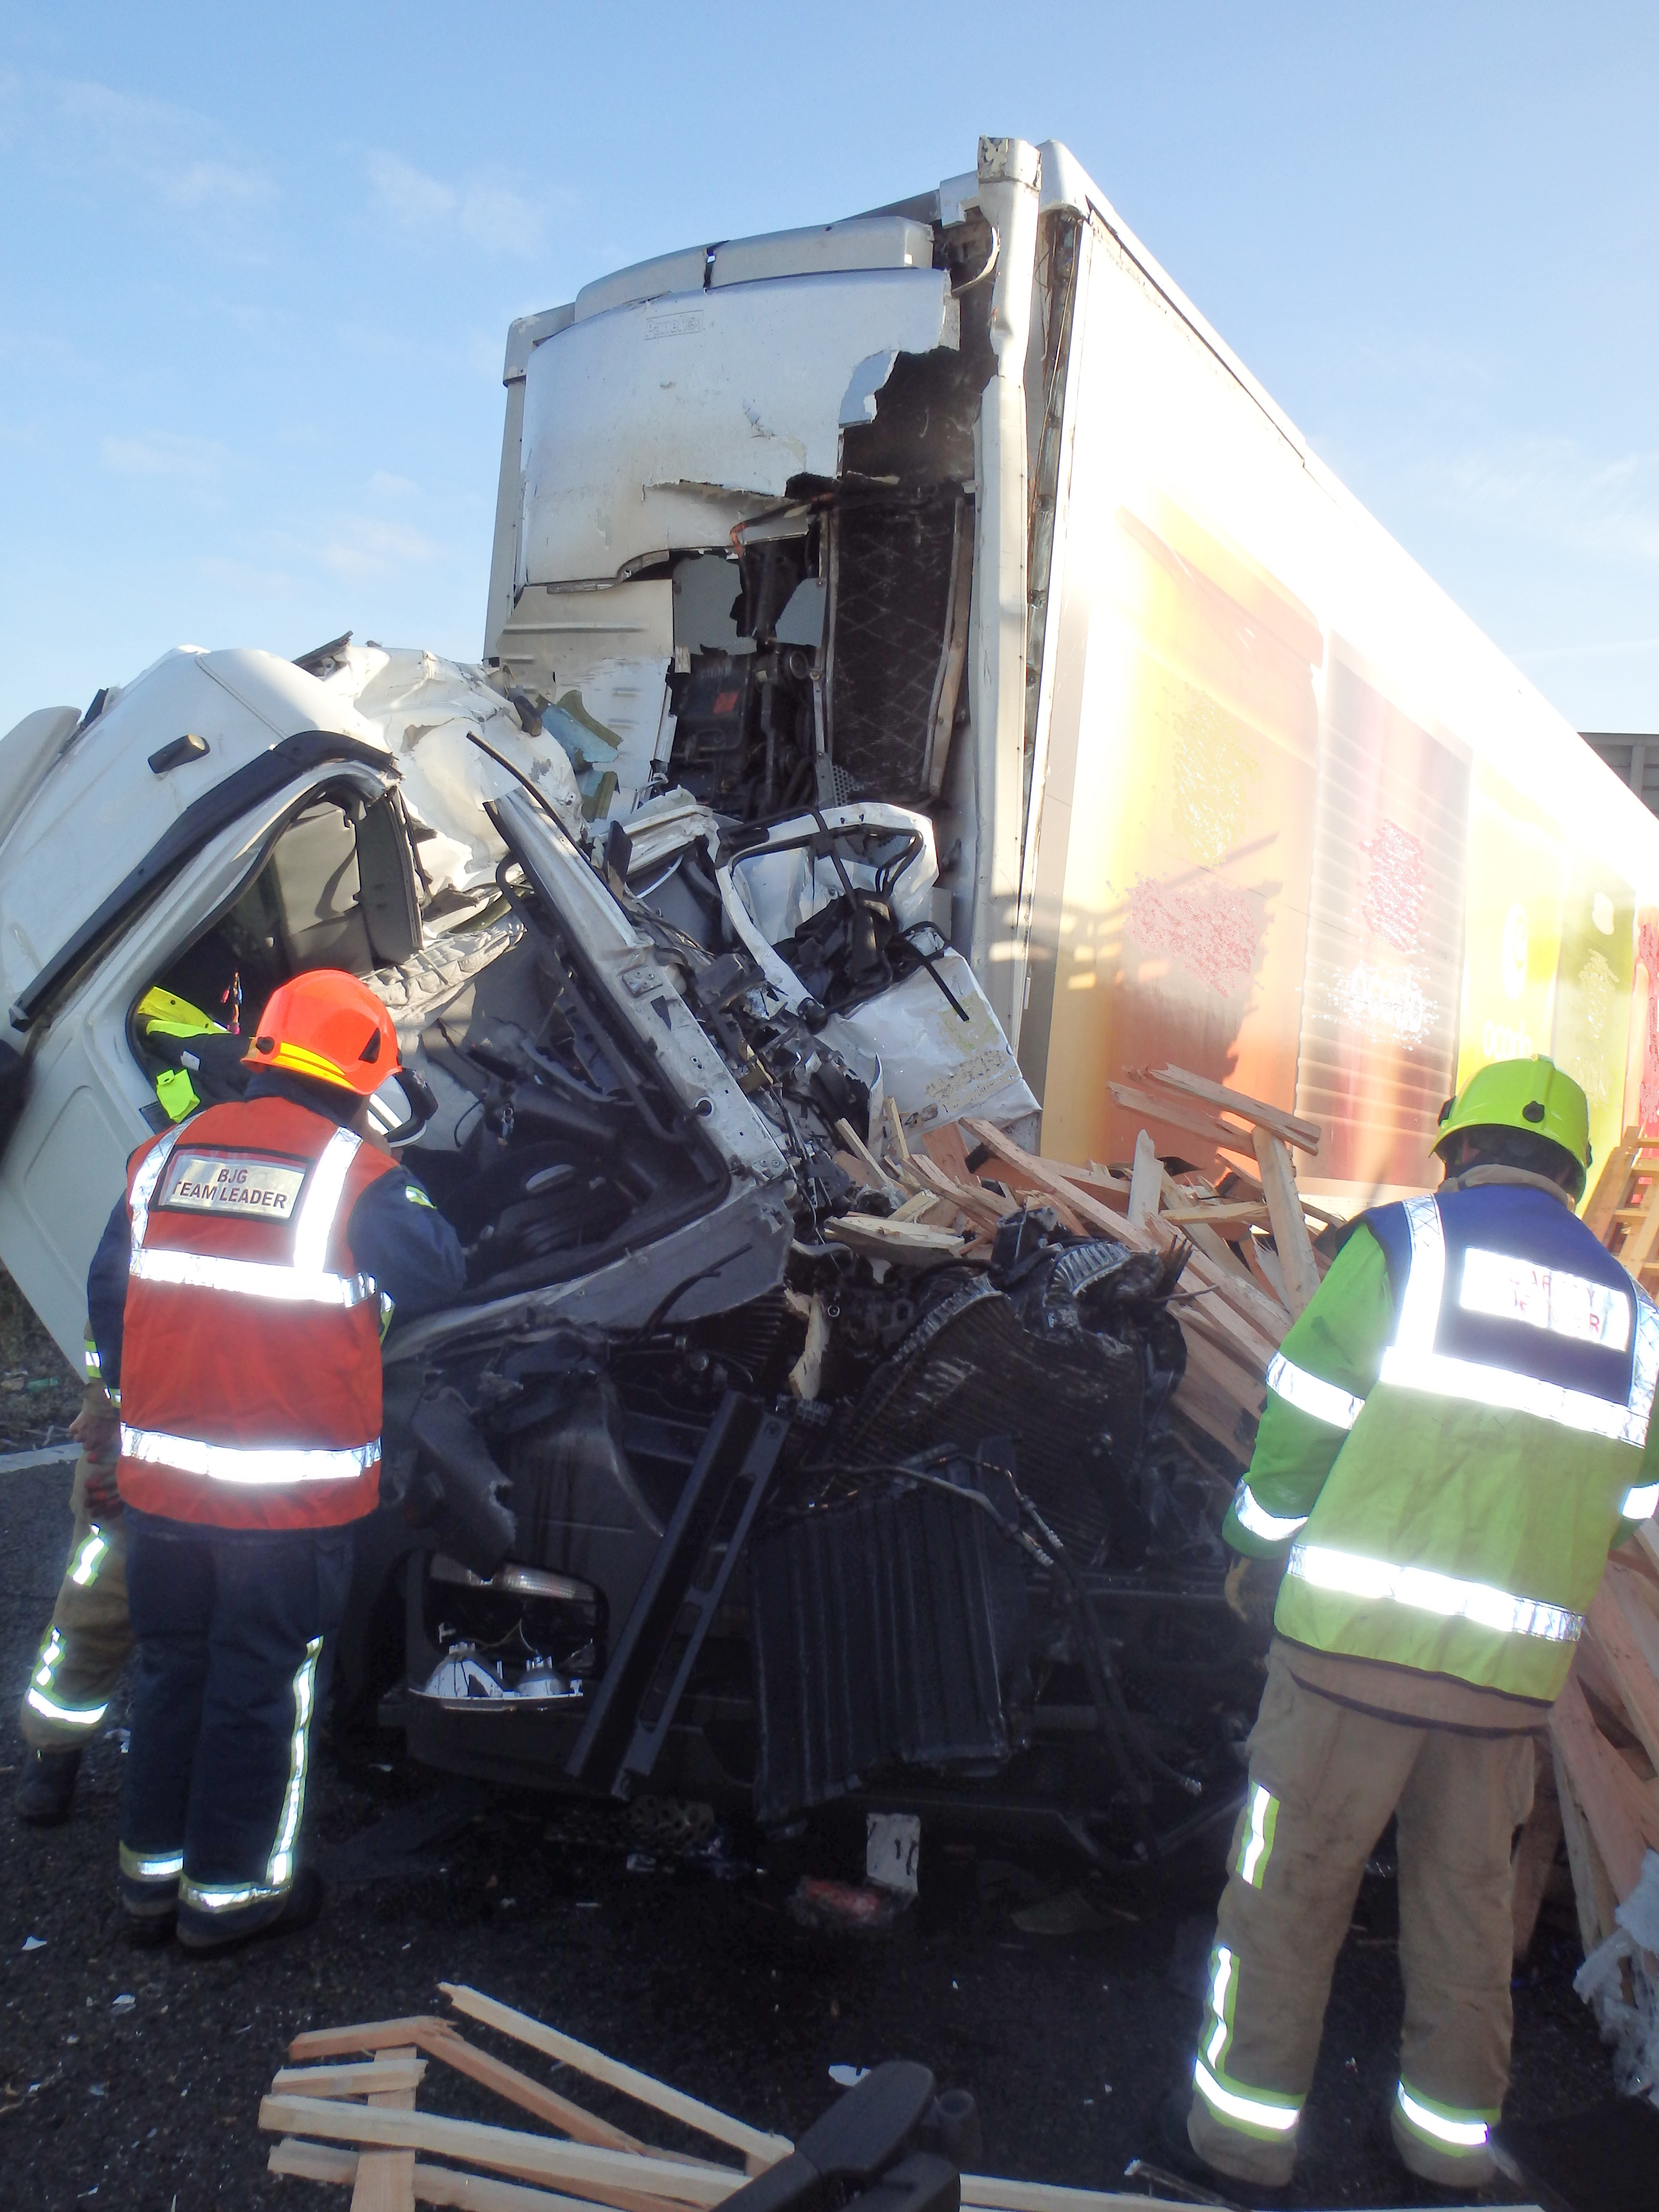 18-June---Lorry-vs-Lorry-on-M25-nr-Dartford-Hazleman--Pearce.jpg